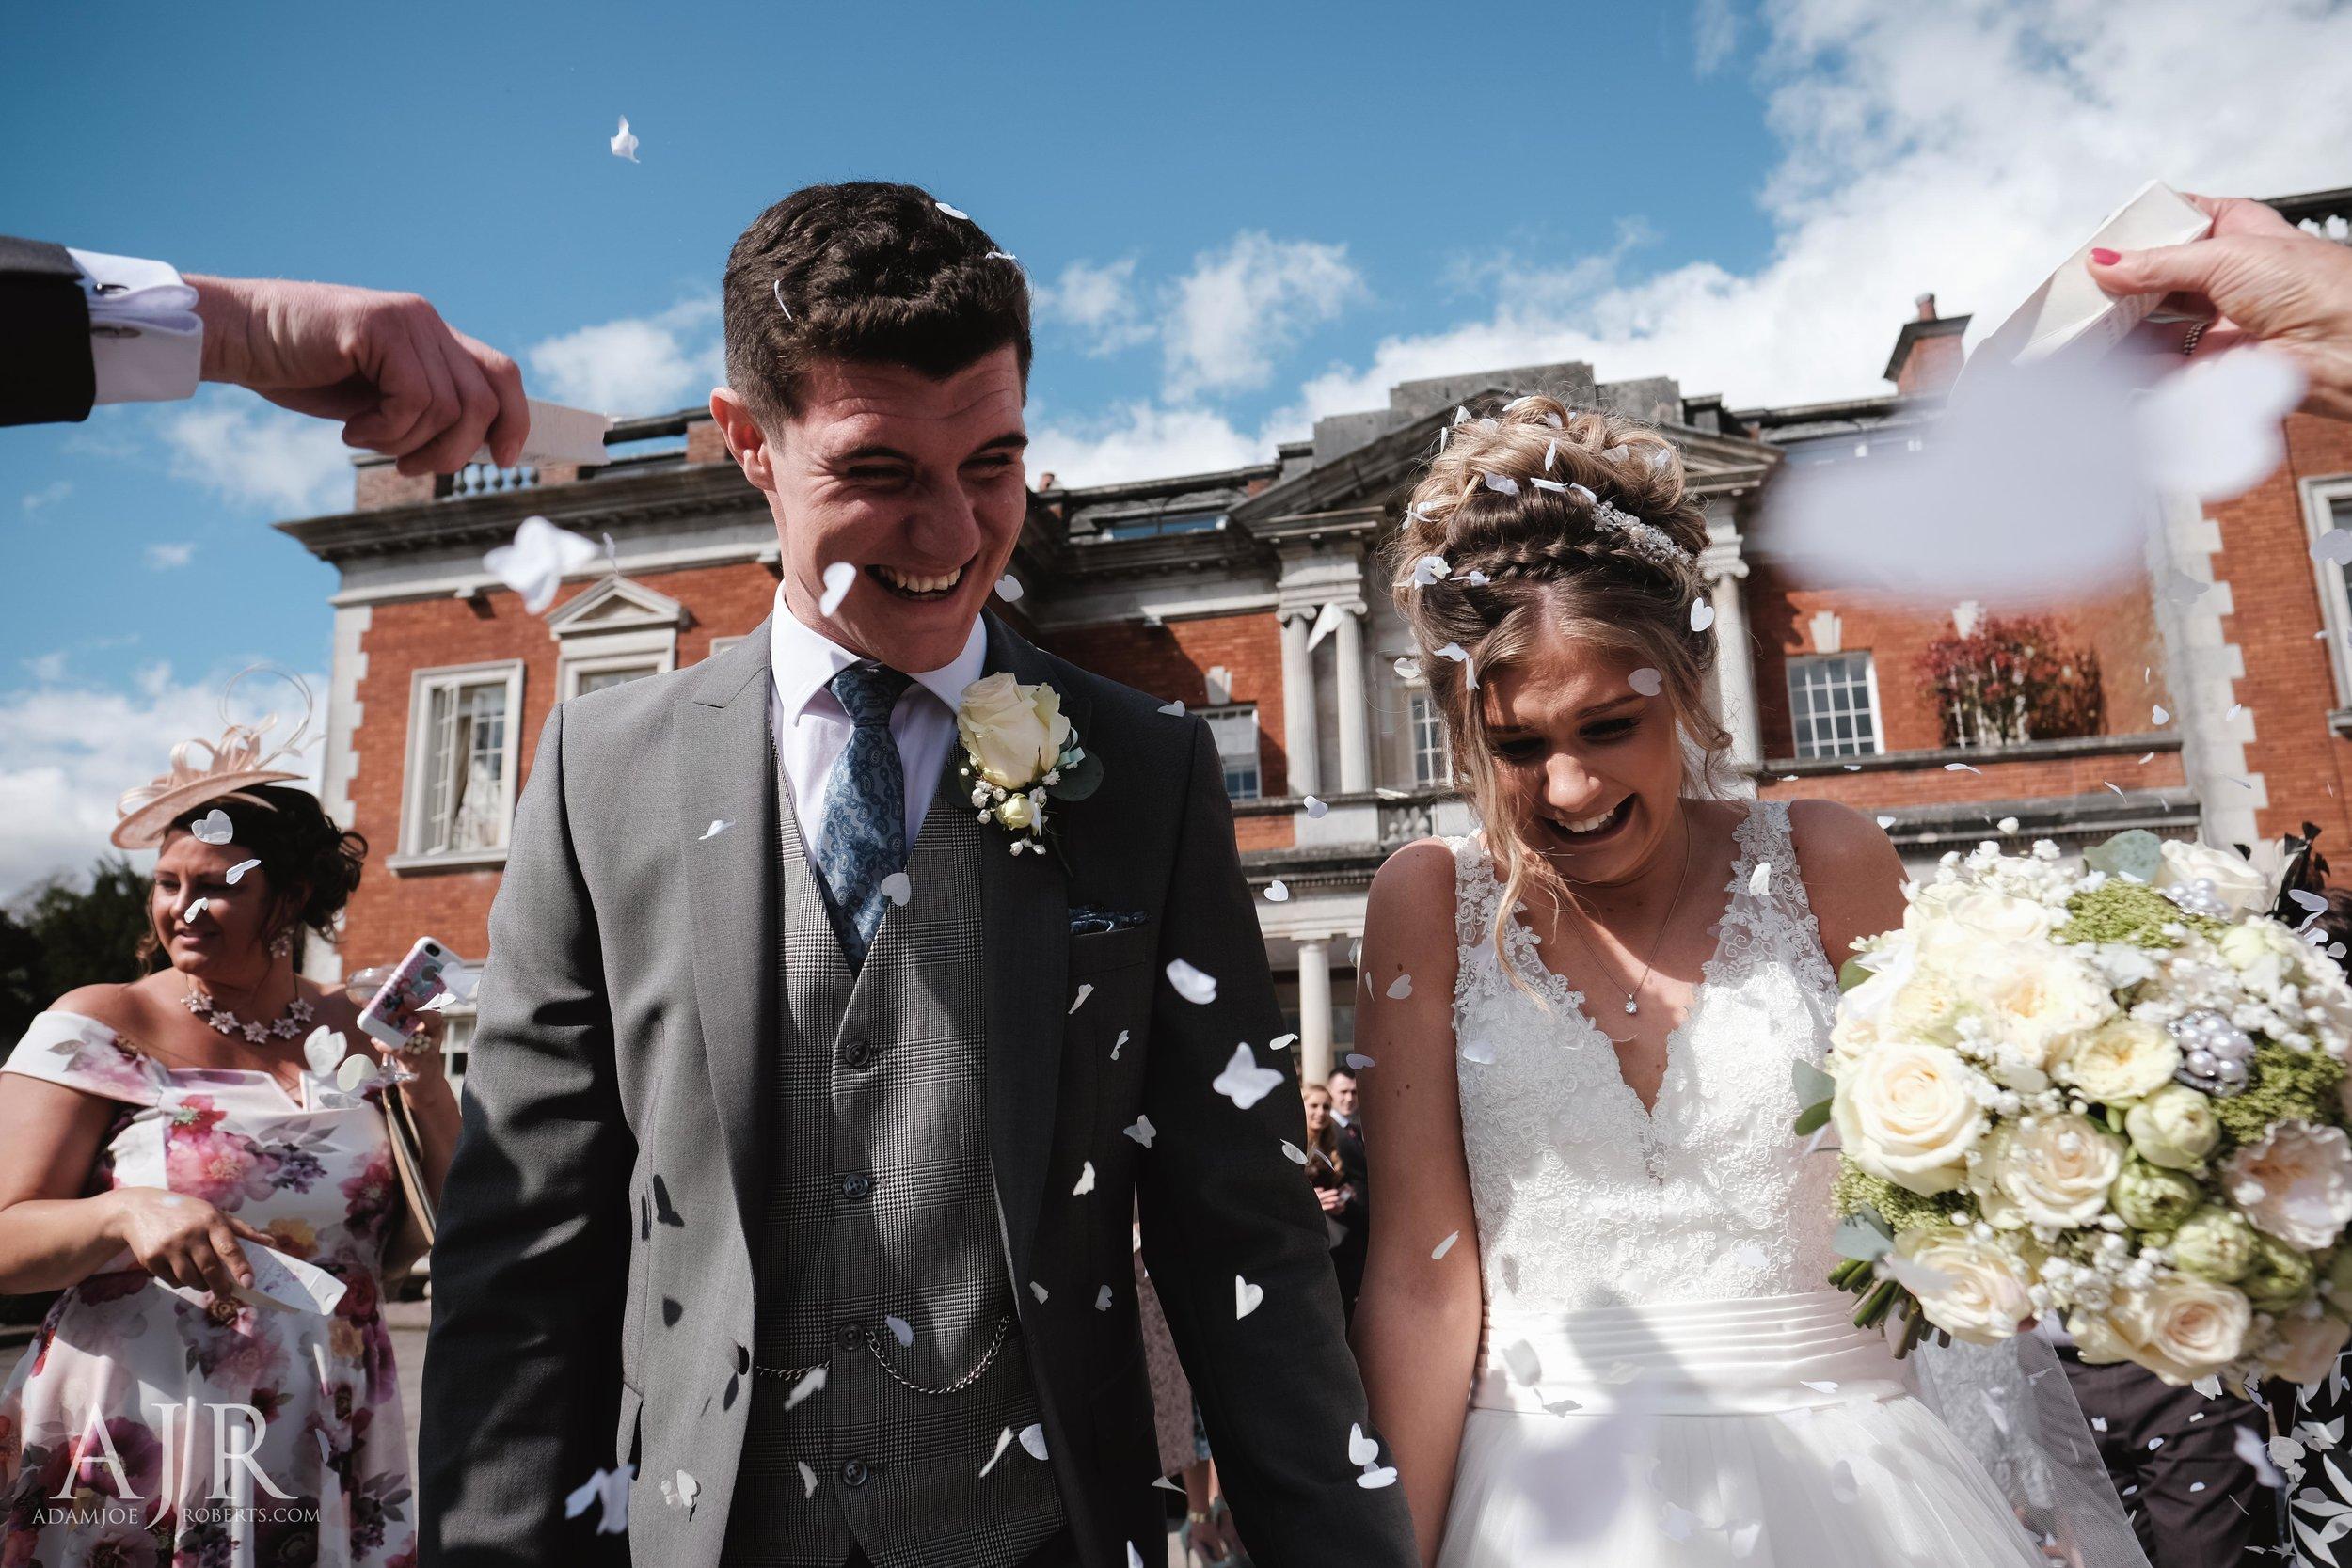 Eaves hall documenrty wedding photography | widnes cheshire wedding photographer sneak peek (7 of 11).jpg